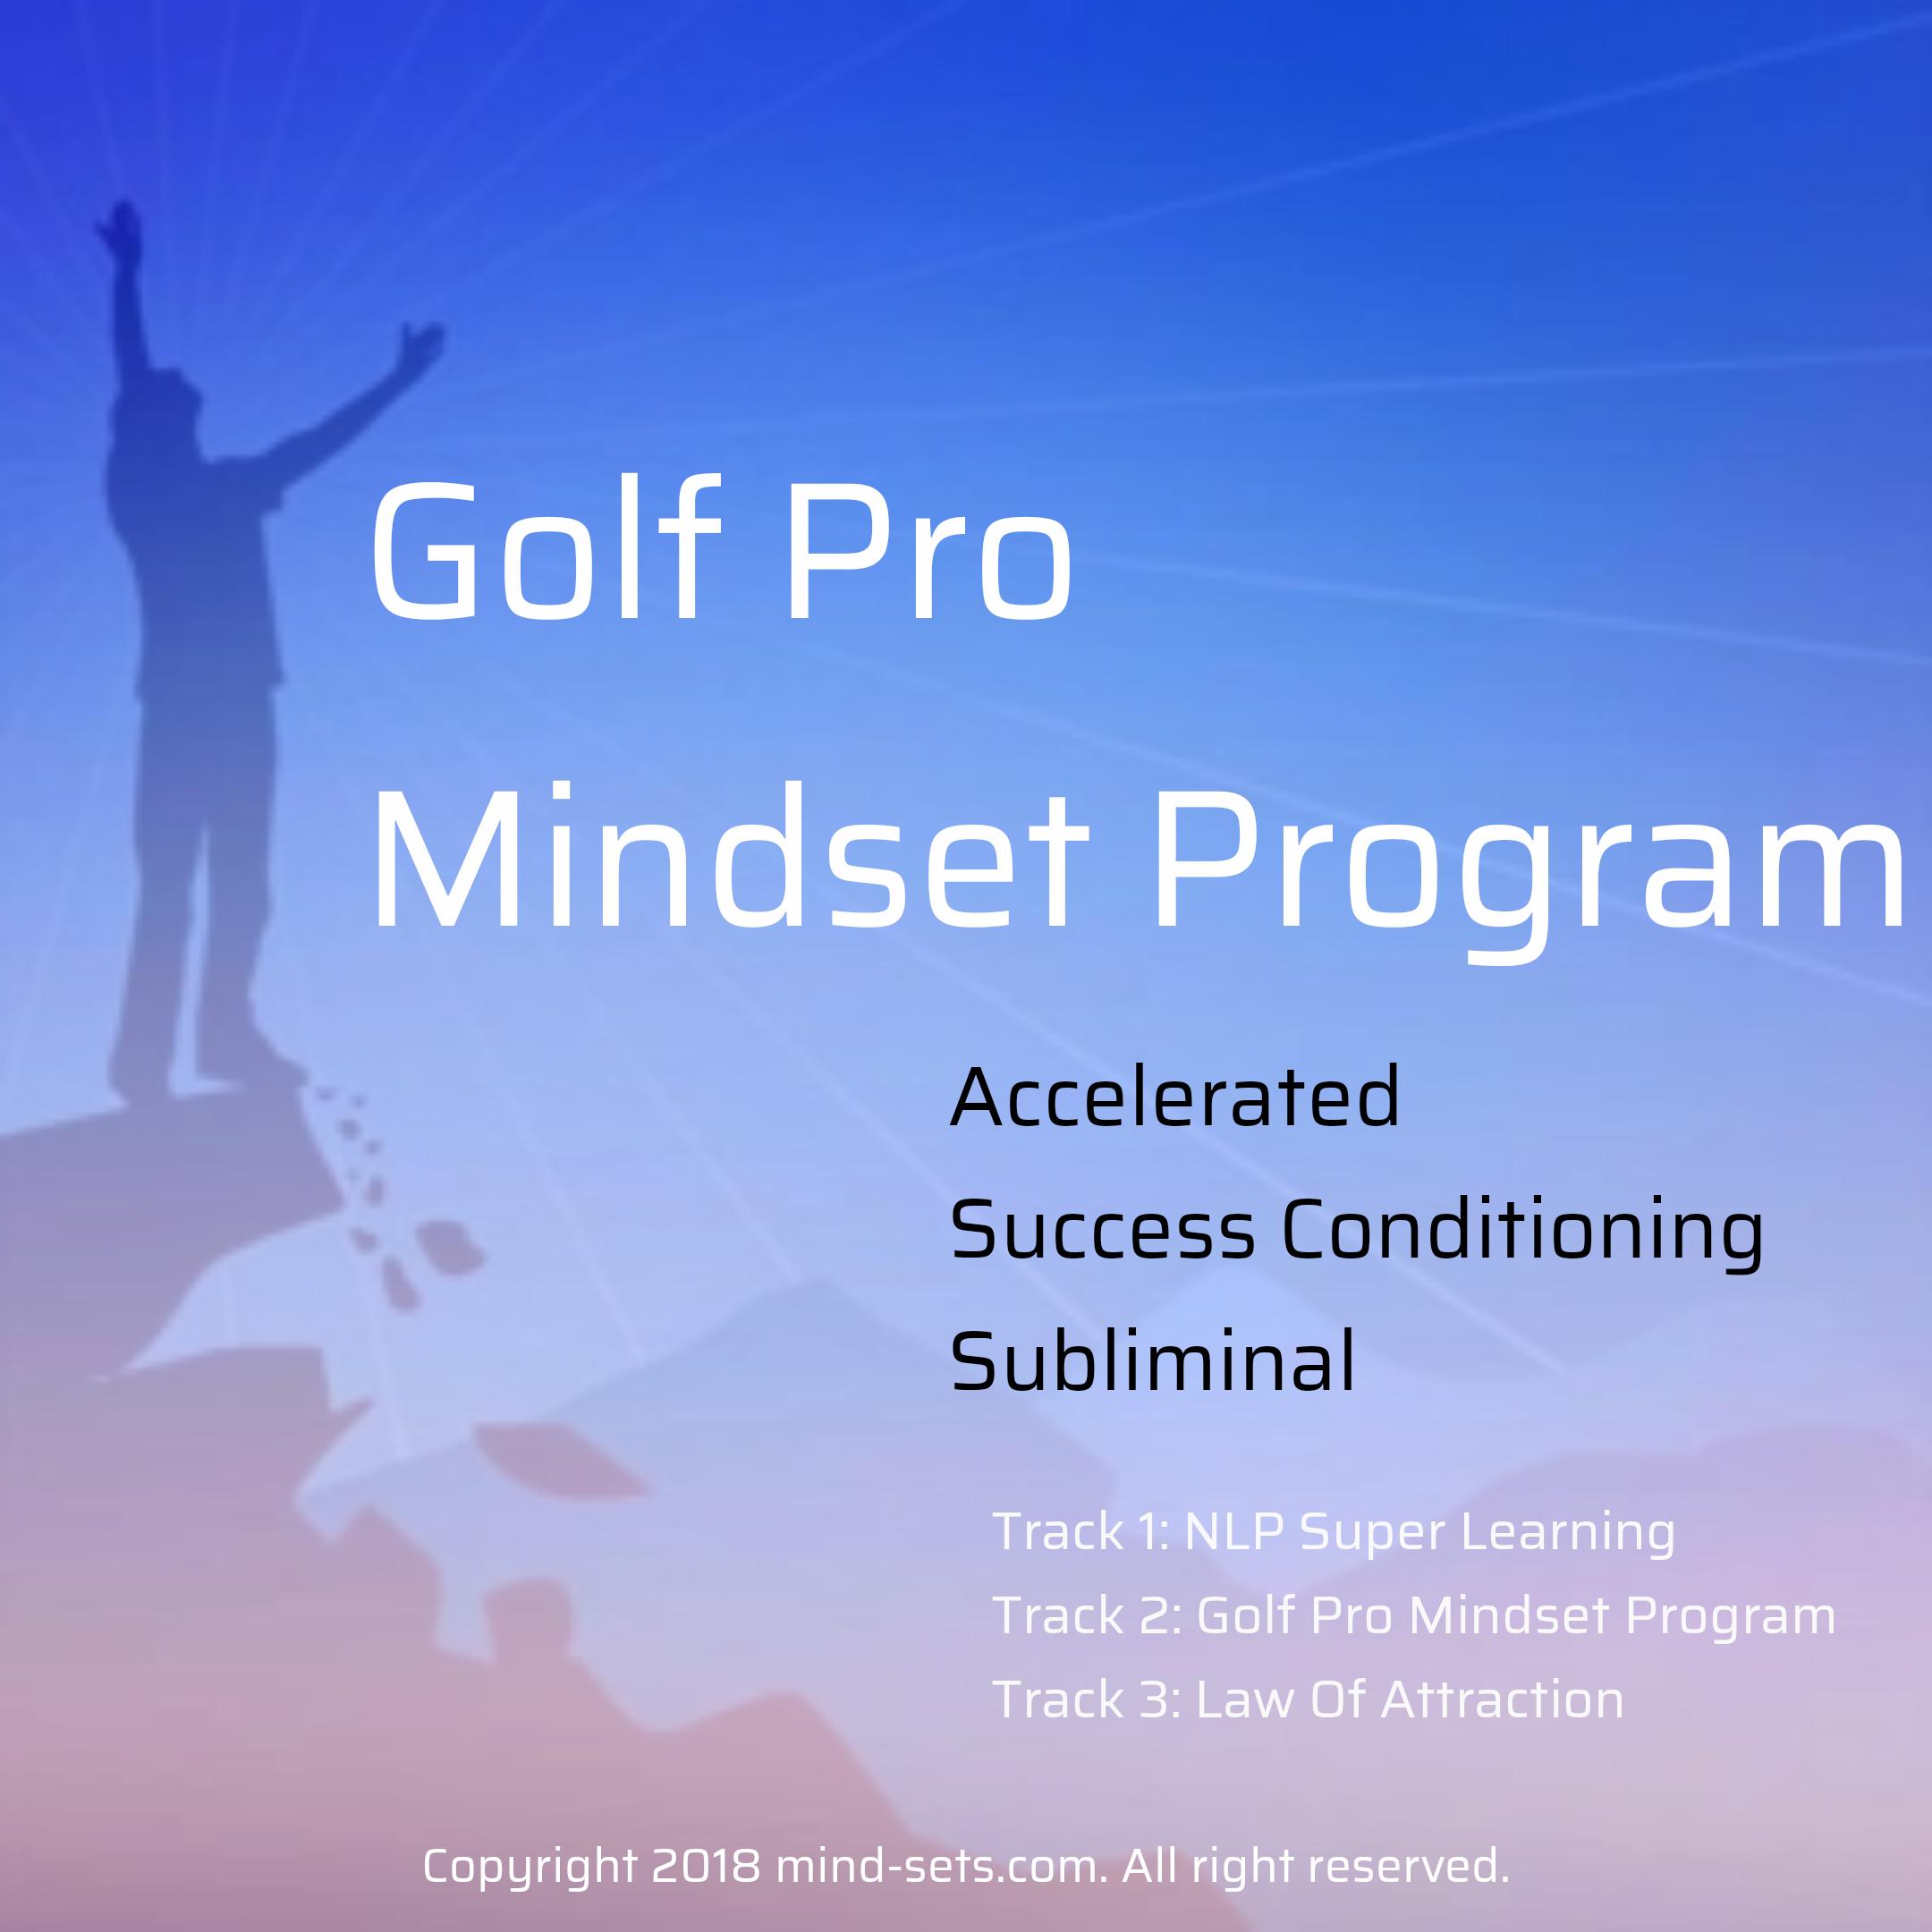 Golf Pro Mindset Program